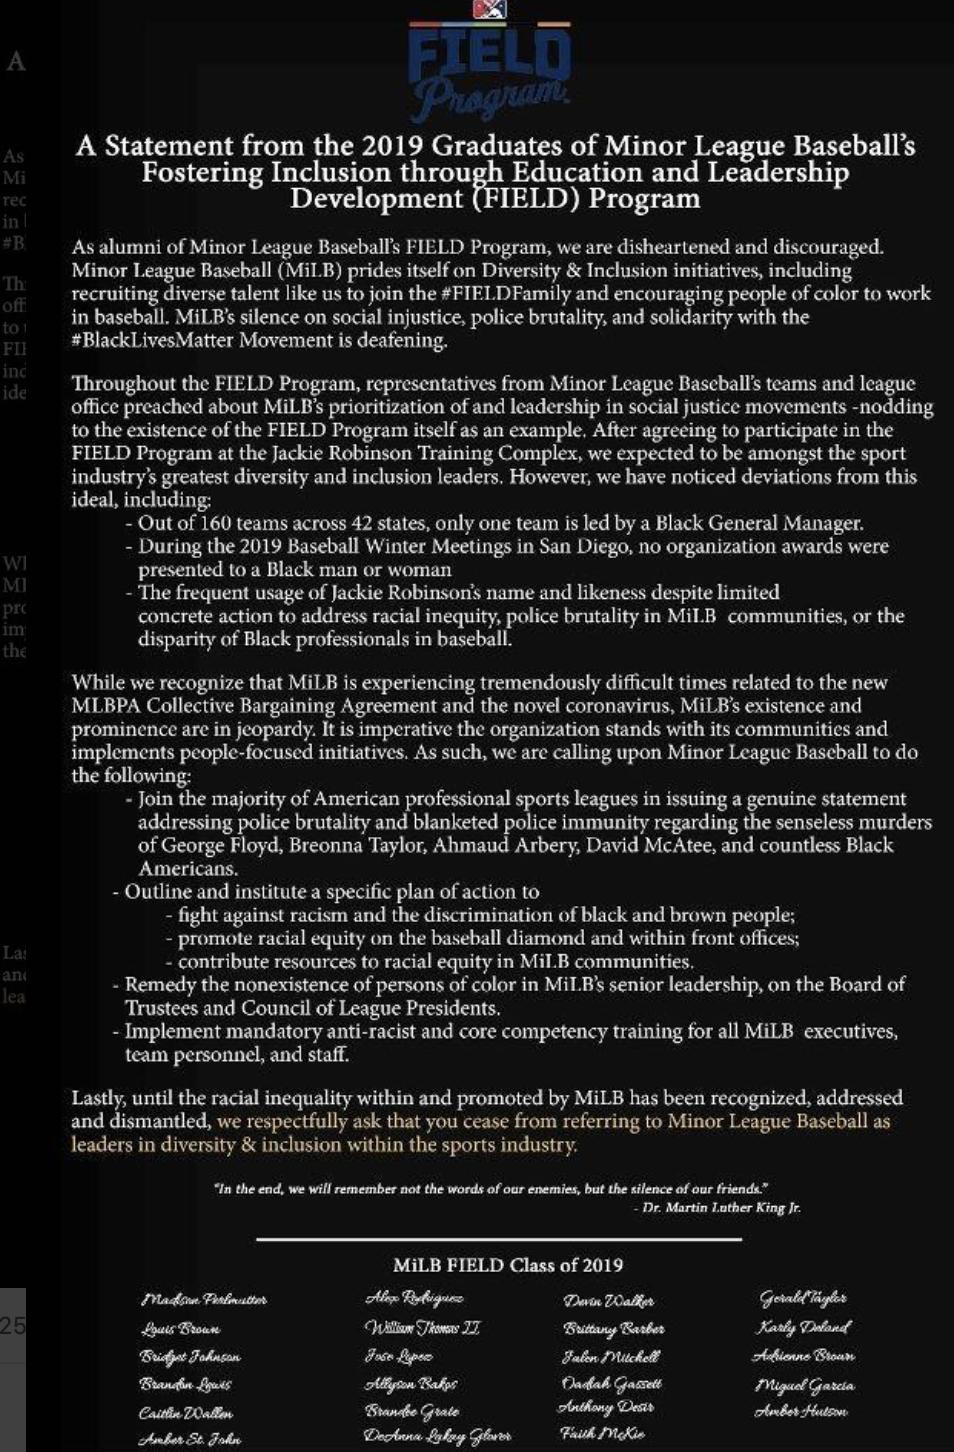 FIELD program statement